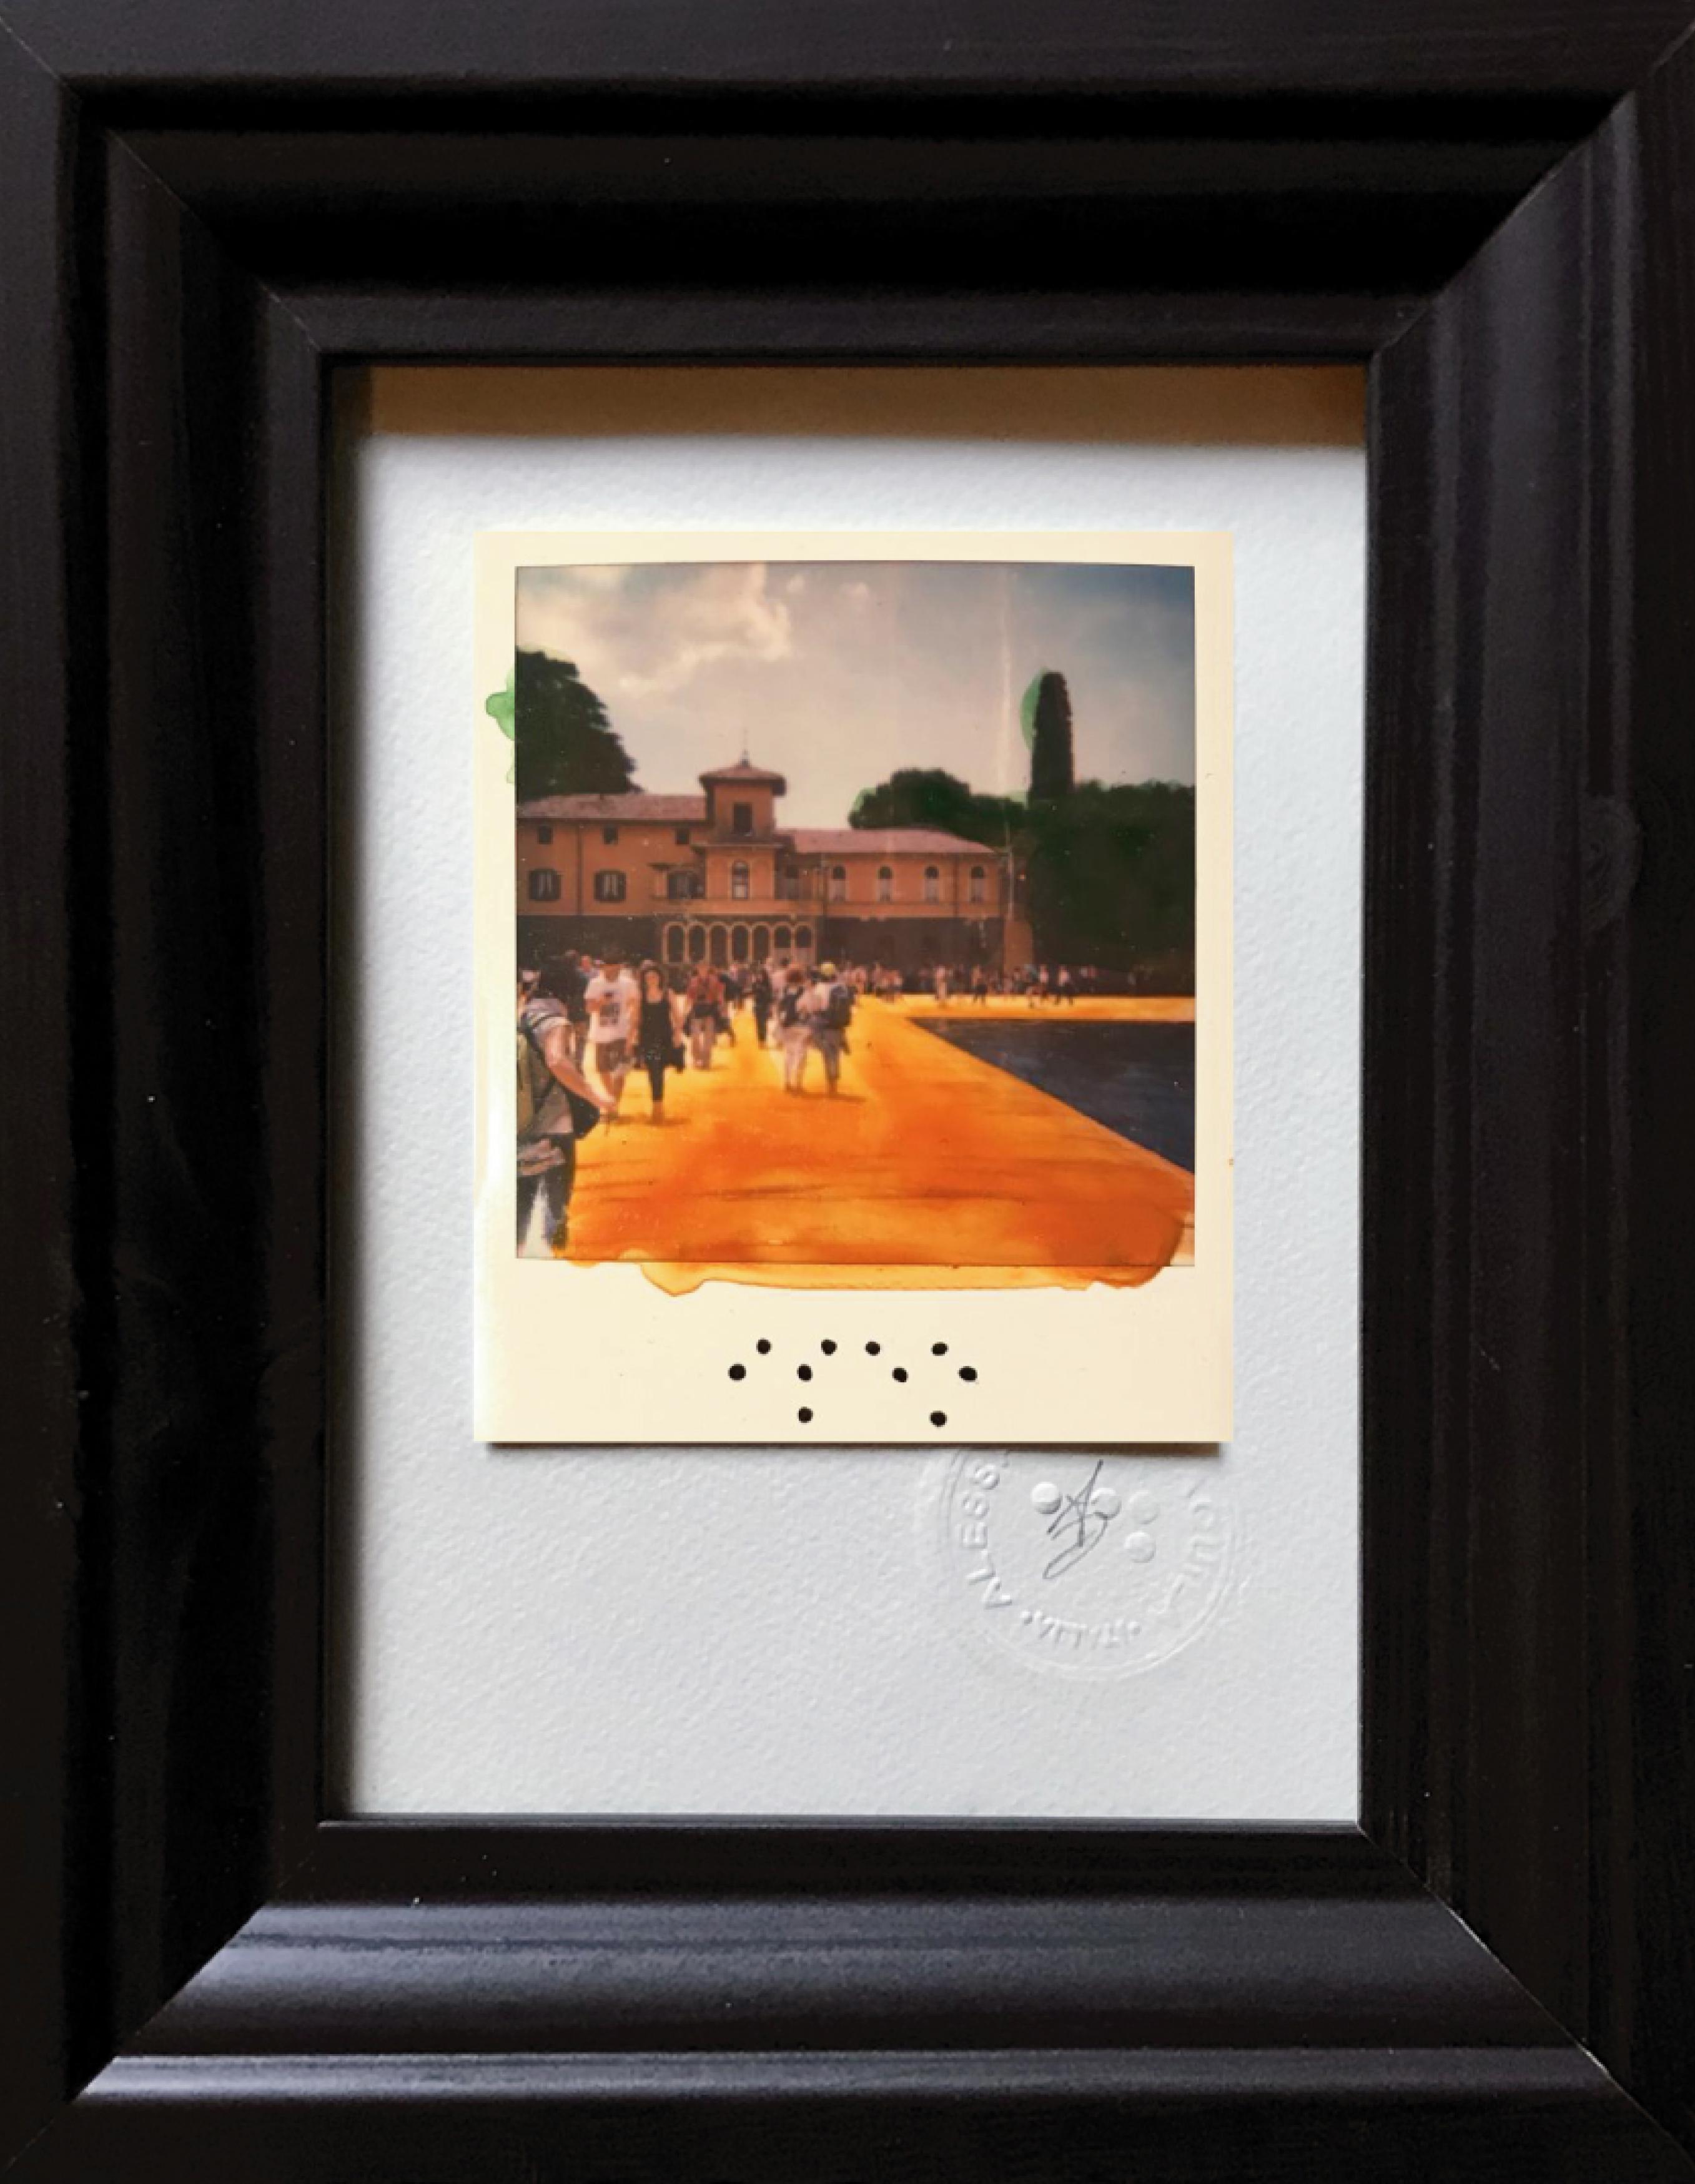 The Floating Polaroid #1